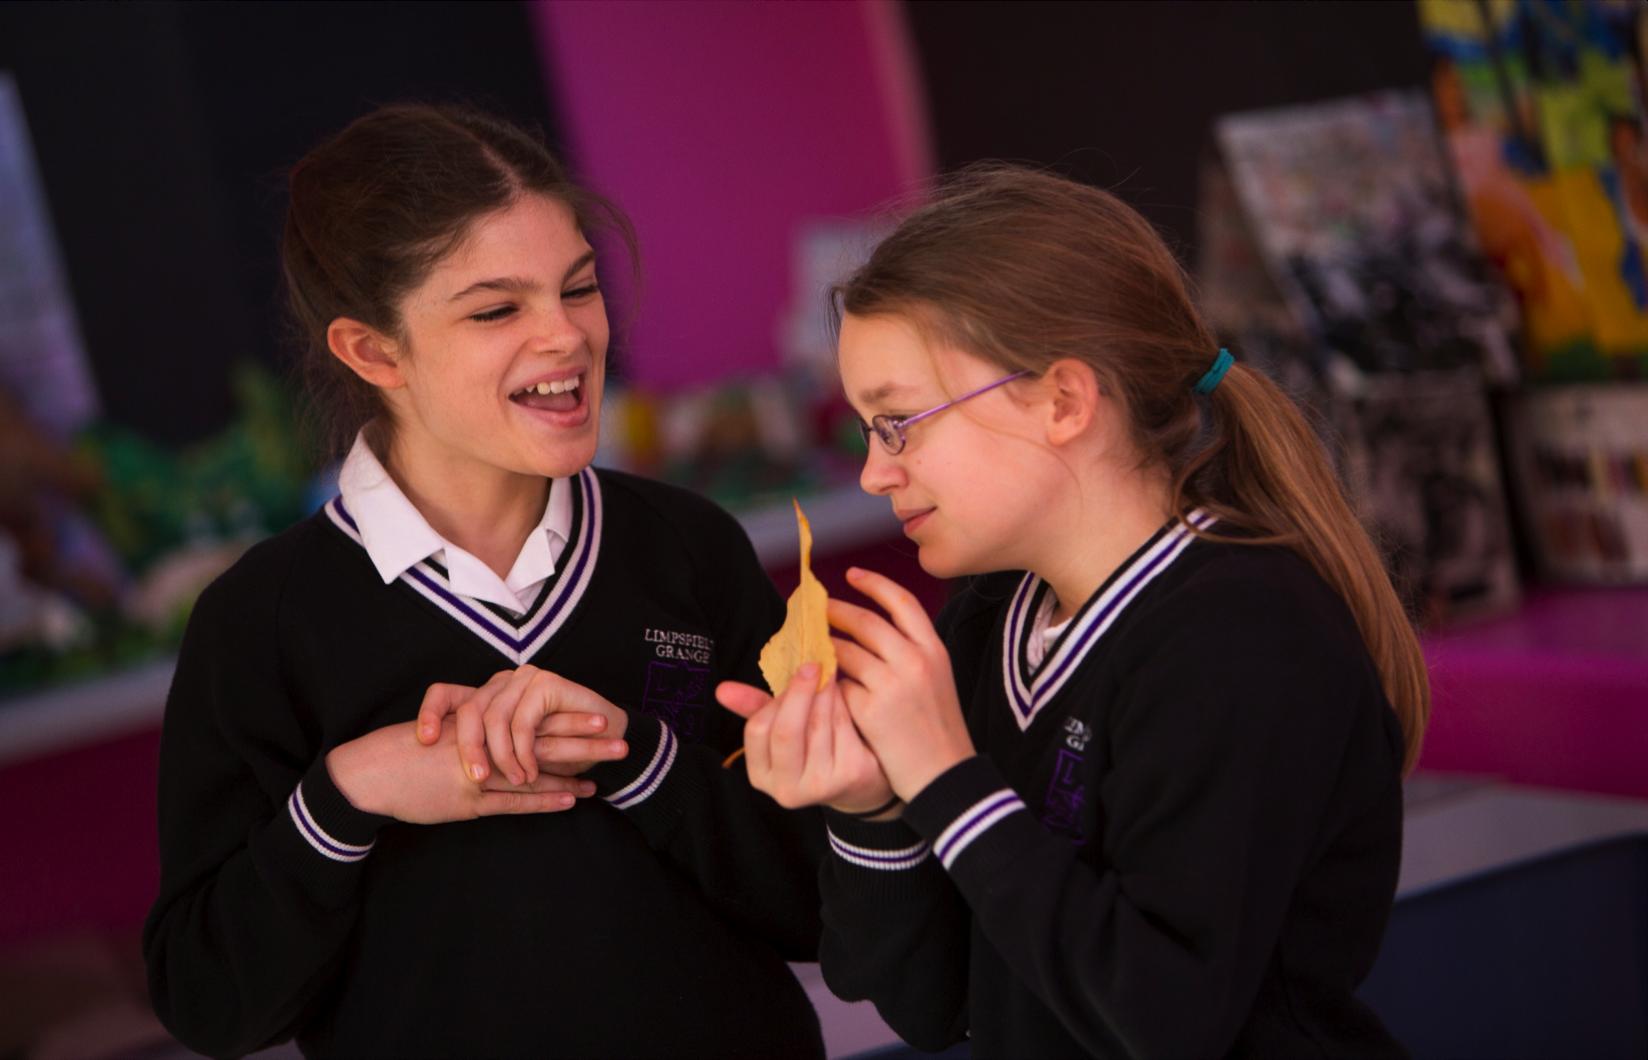 Limpsfield Grange School fiction novel highlights girls on the spectrum